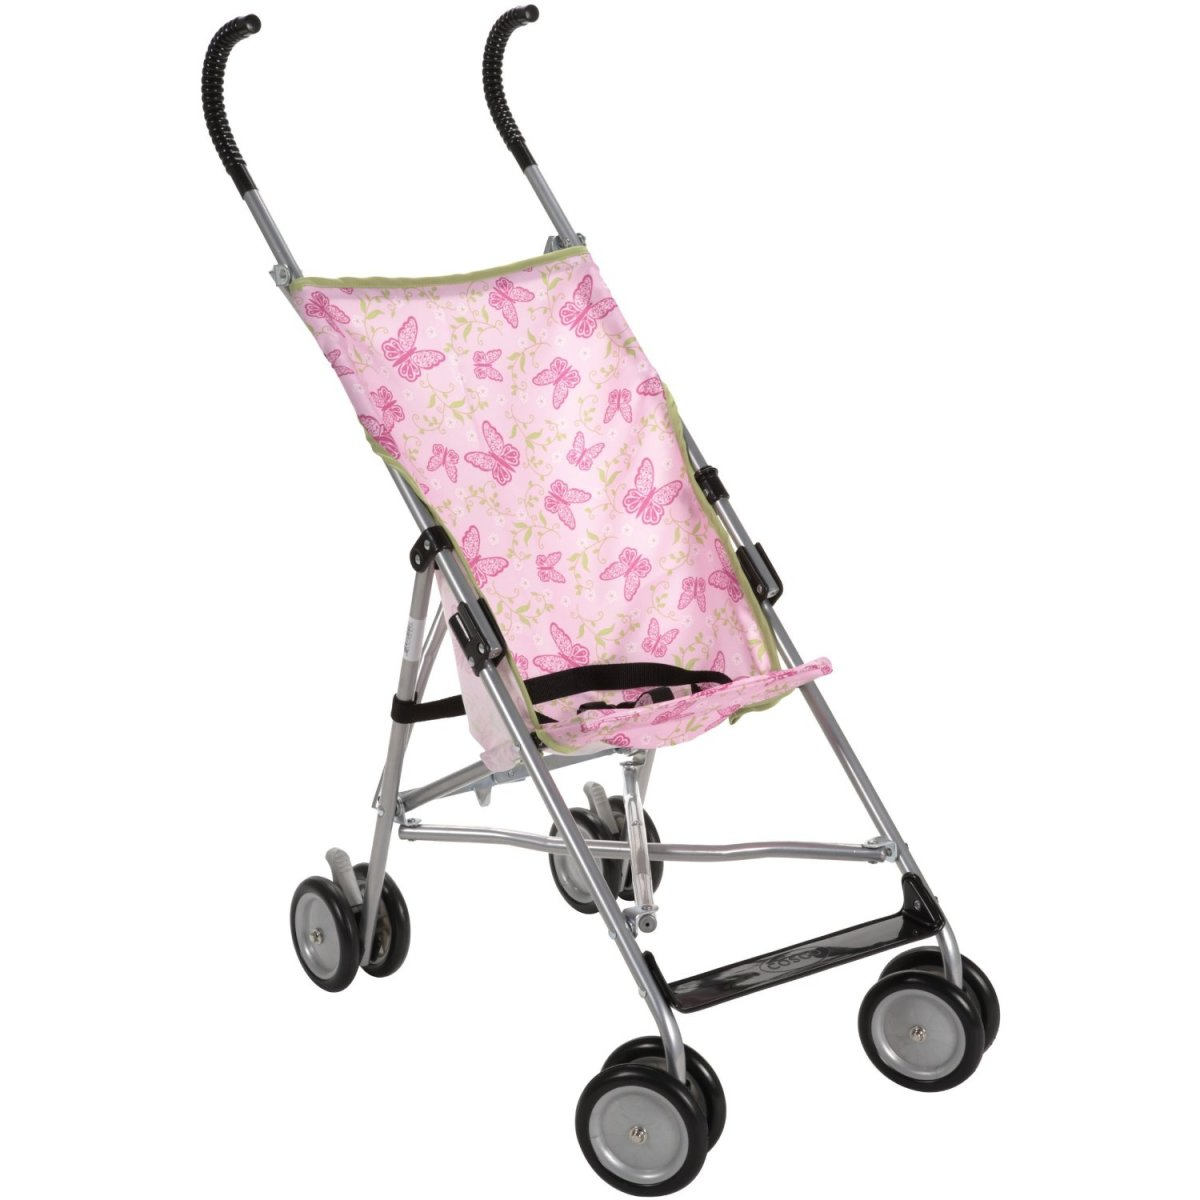 Cosco Stroller And Umbrella Stroller, The Best Lightweight Baby Strollers